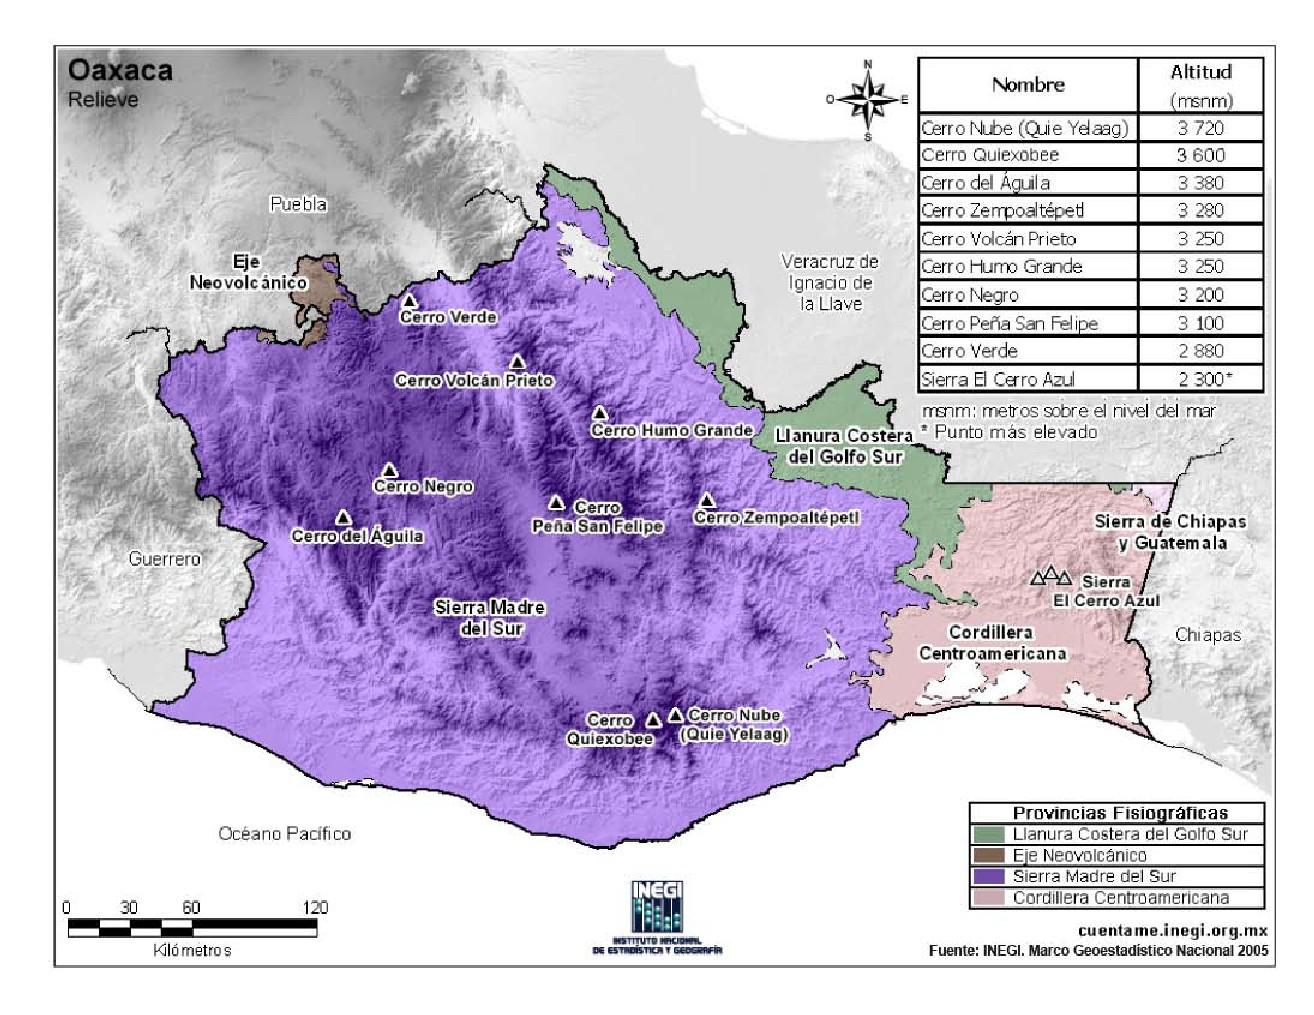 Mapa en color de montañas de Oaxaca. INEGI de México